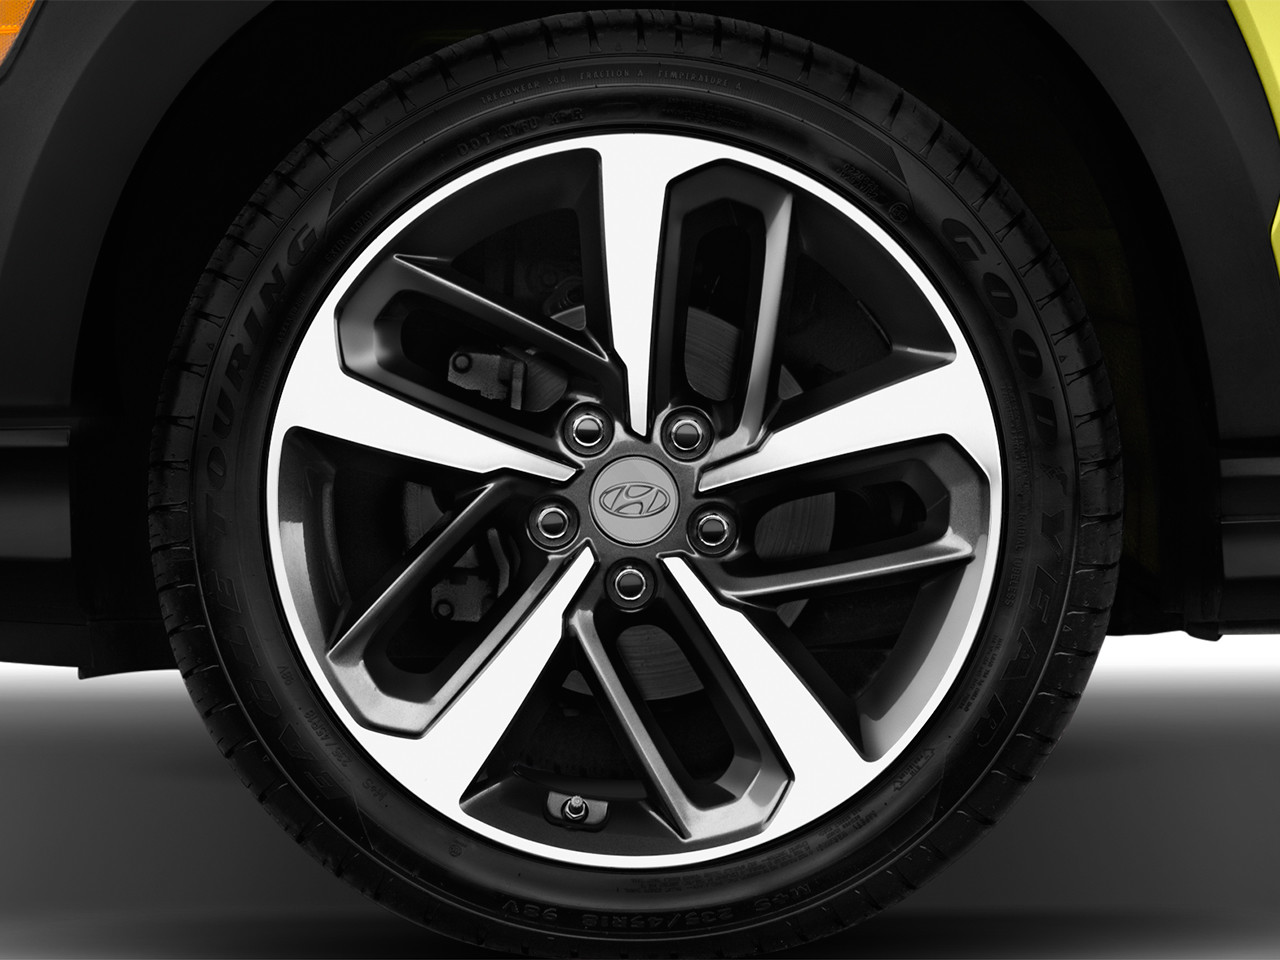 New Kona for Sale in Springfield, IL - Green Hyundai